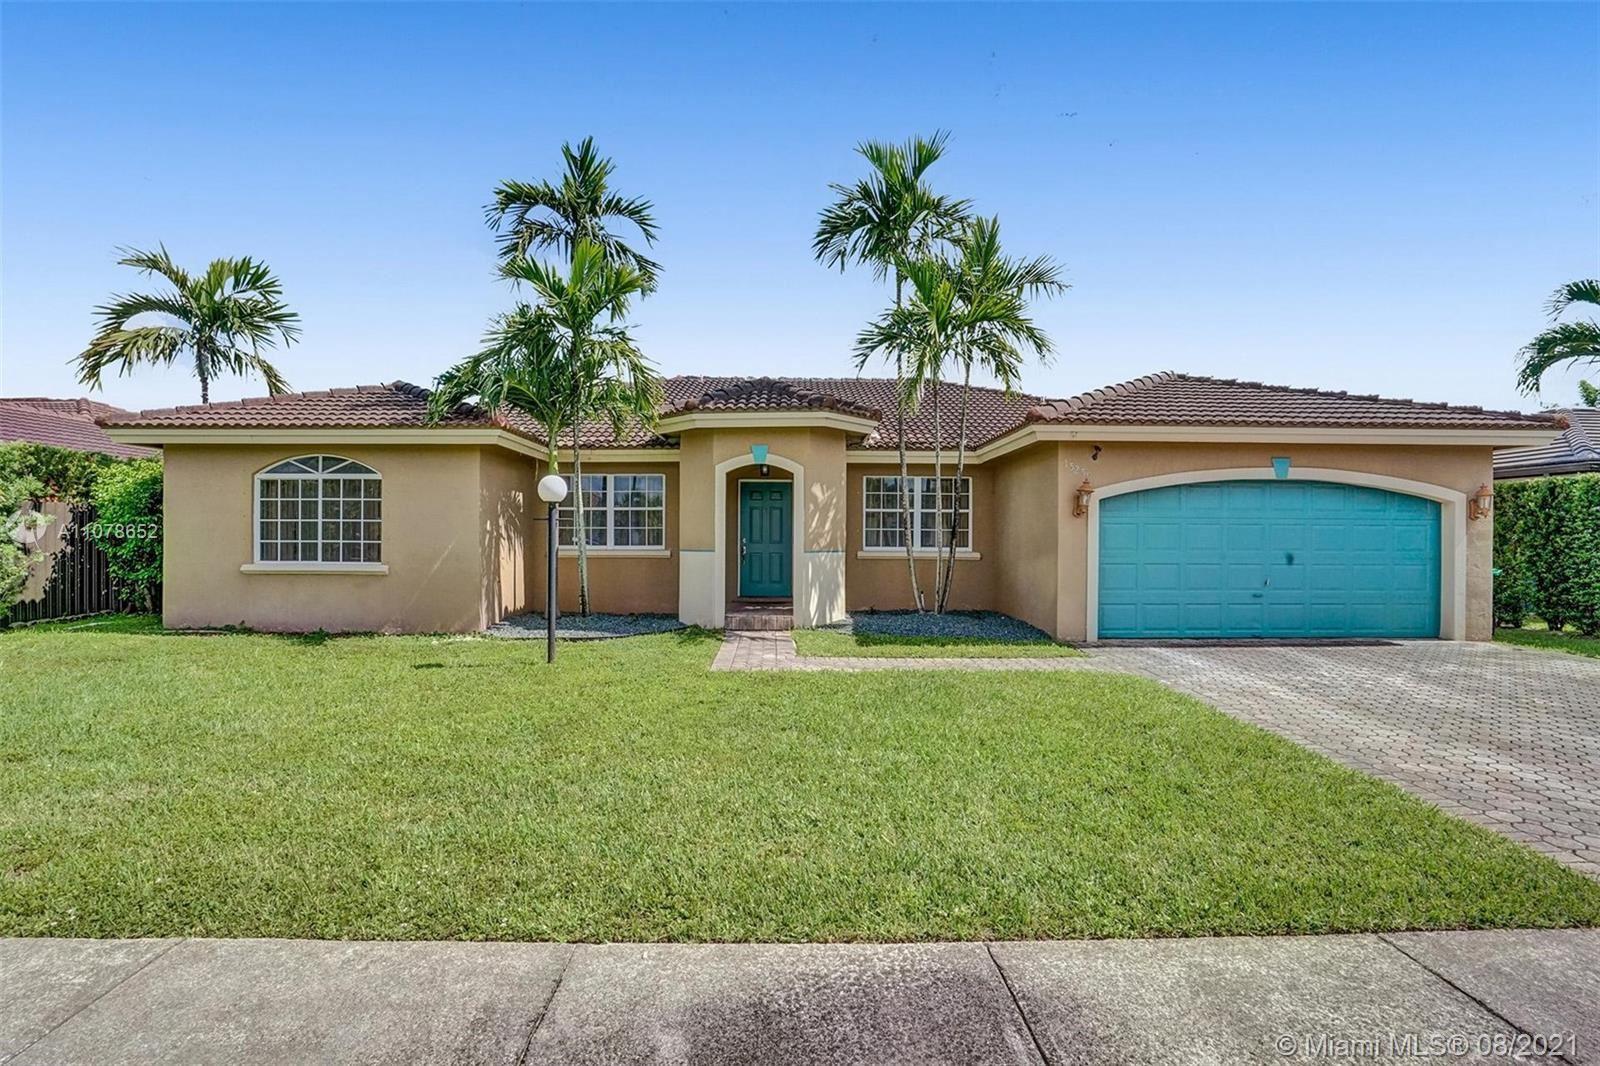 15259 SW 172nd Ter, Miami, FL 33187 - #: A11078652